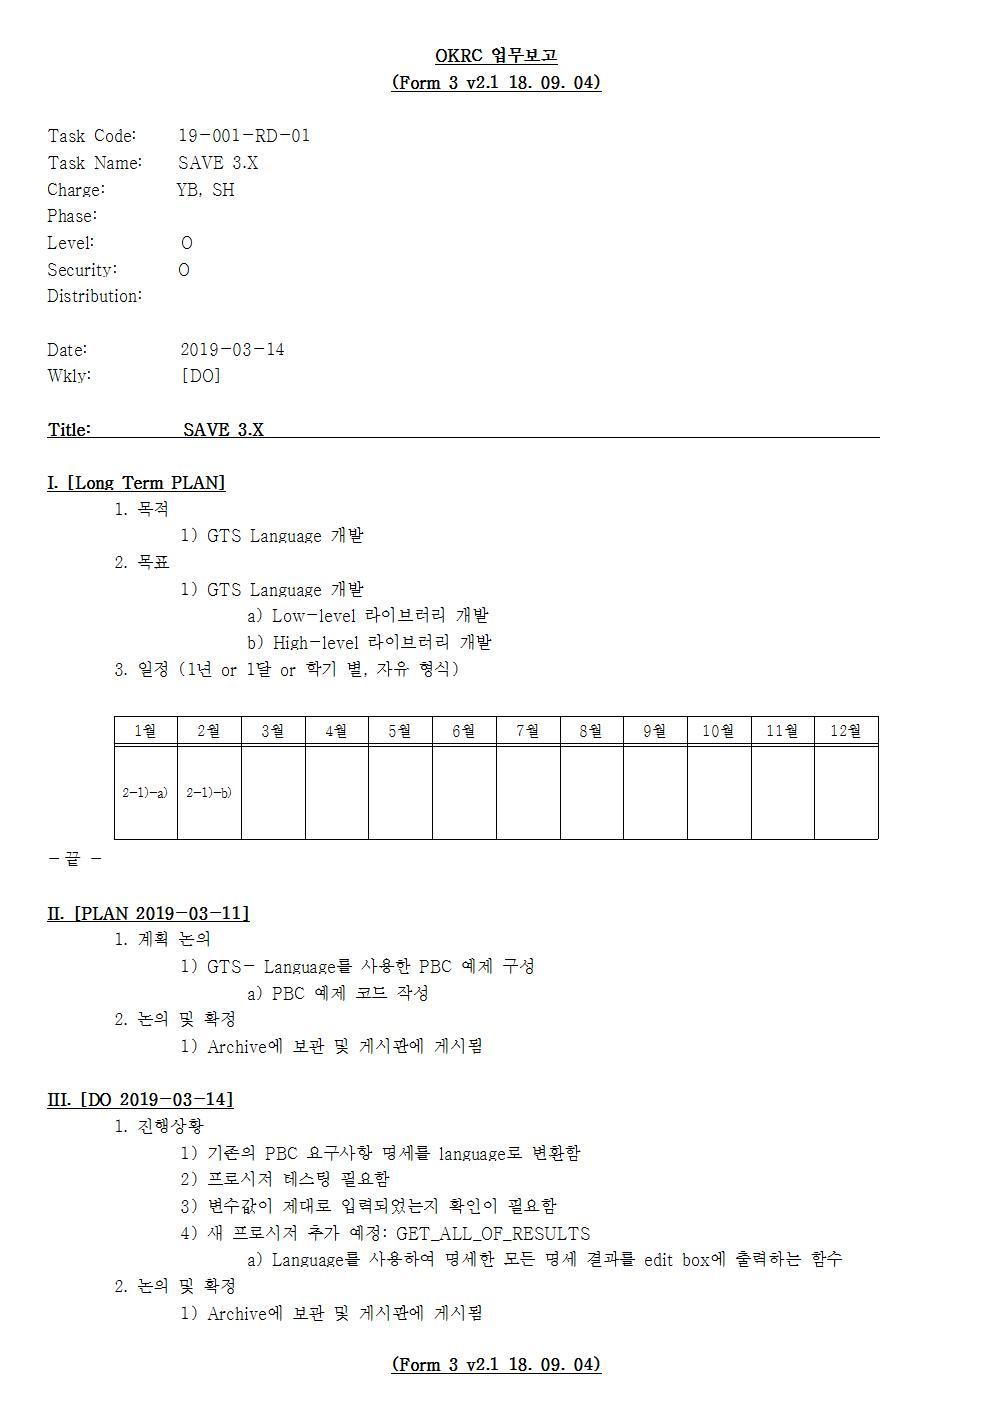 D-[19-001-RD-01]-[SAVE 3.X]-[2019-03-14][SH]001.jpg